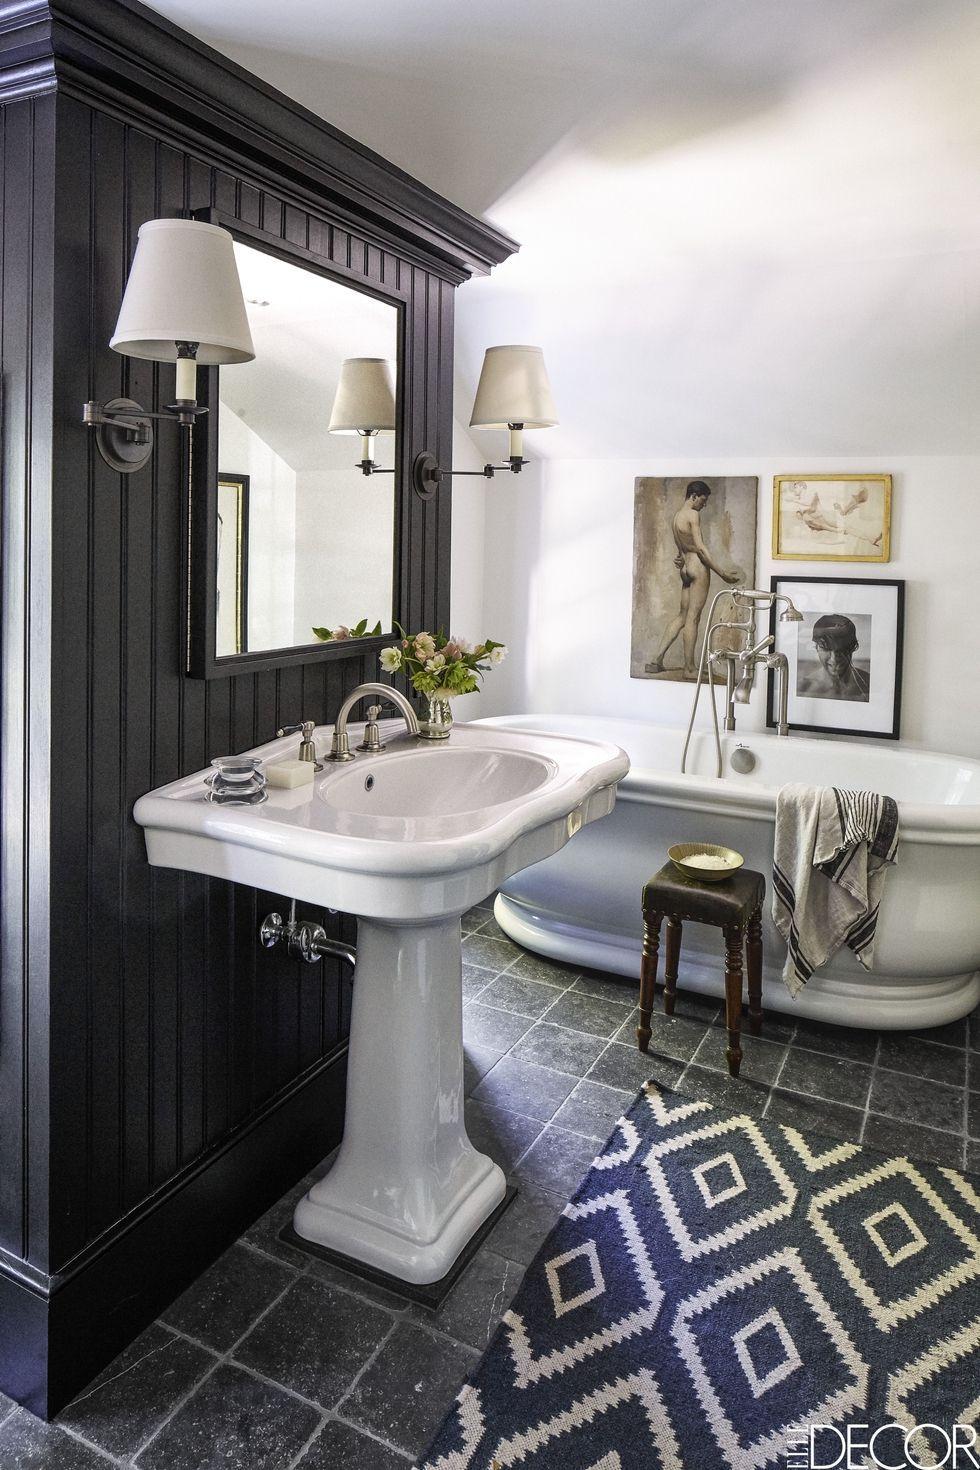 30 Black Room Design Ideas - Decorating With Black